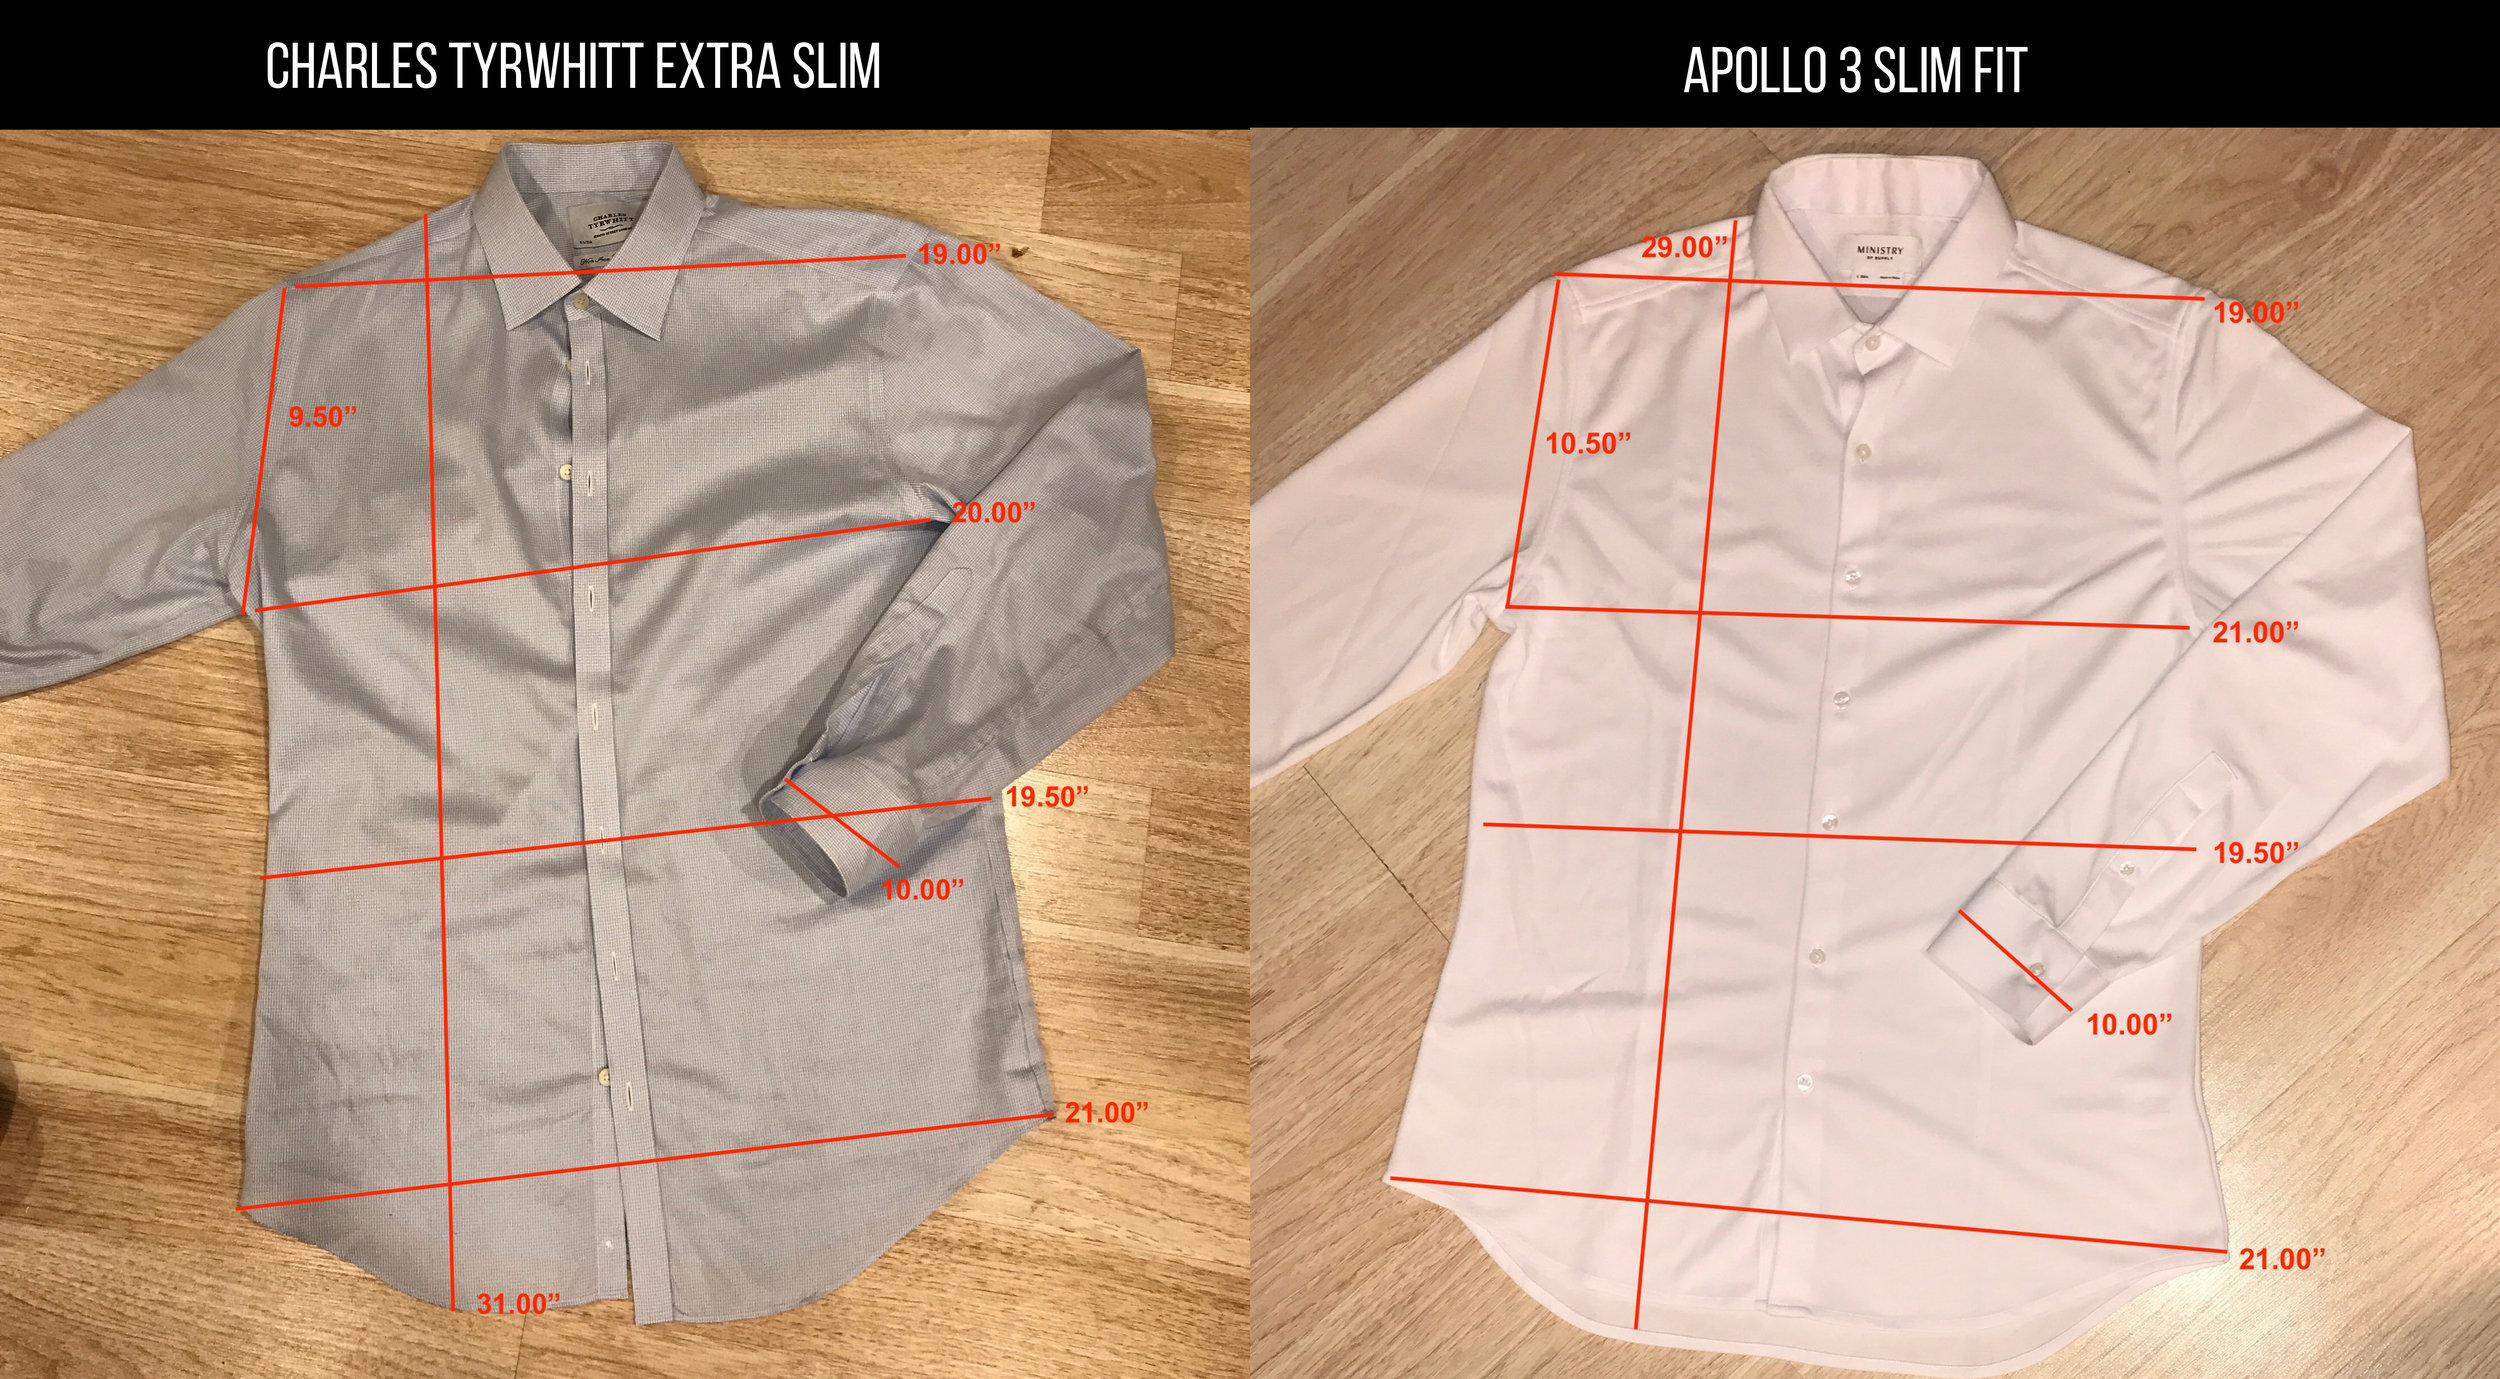 ct shirts vs apollo 3